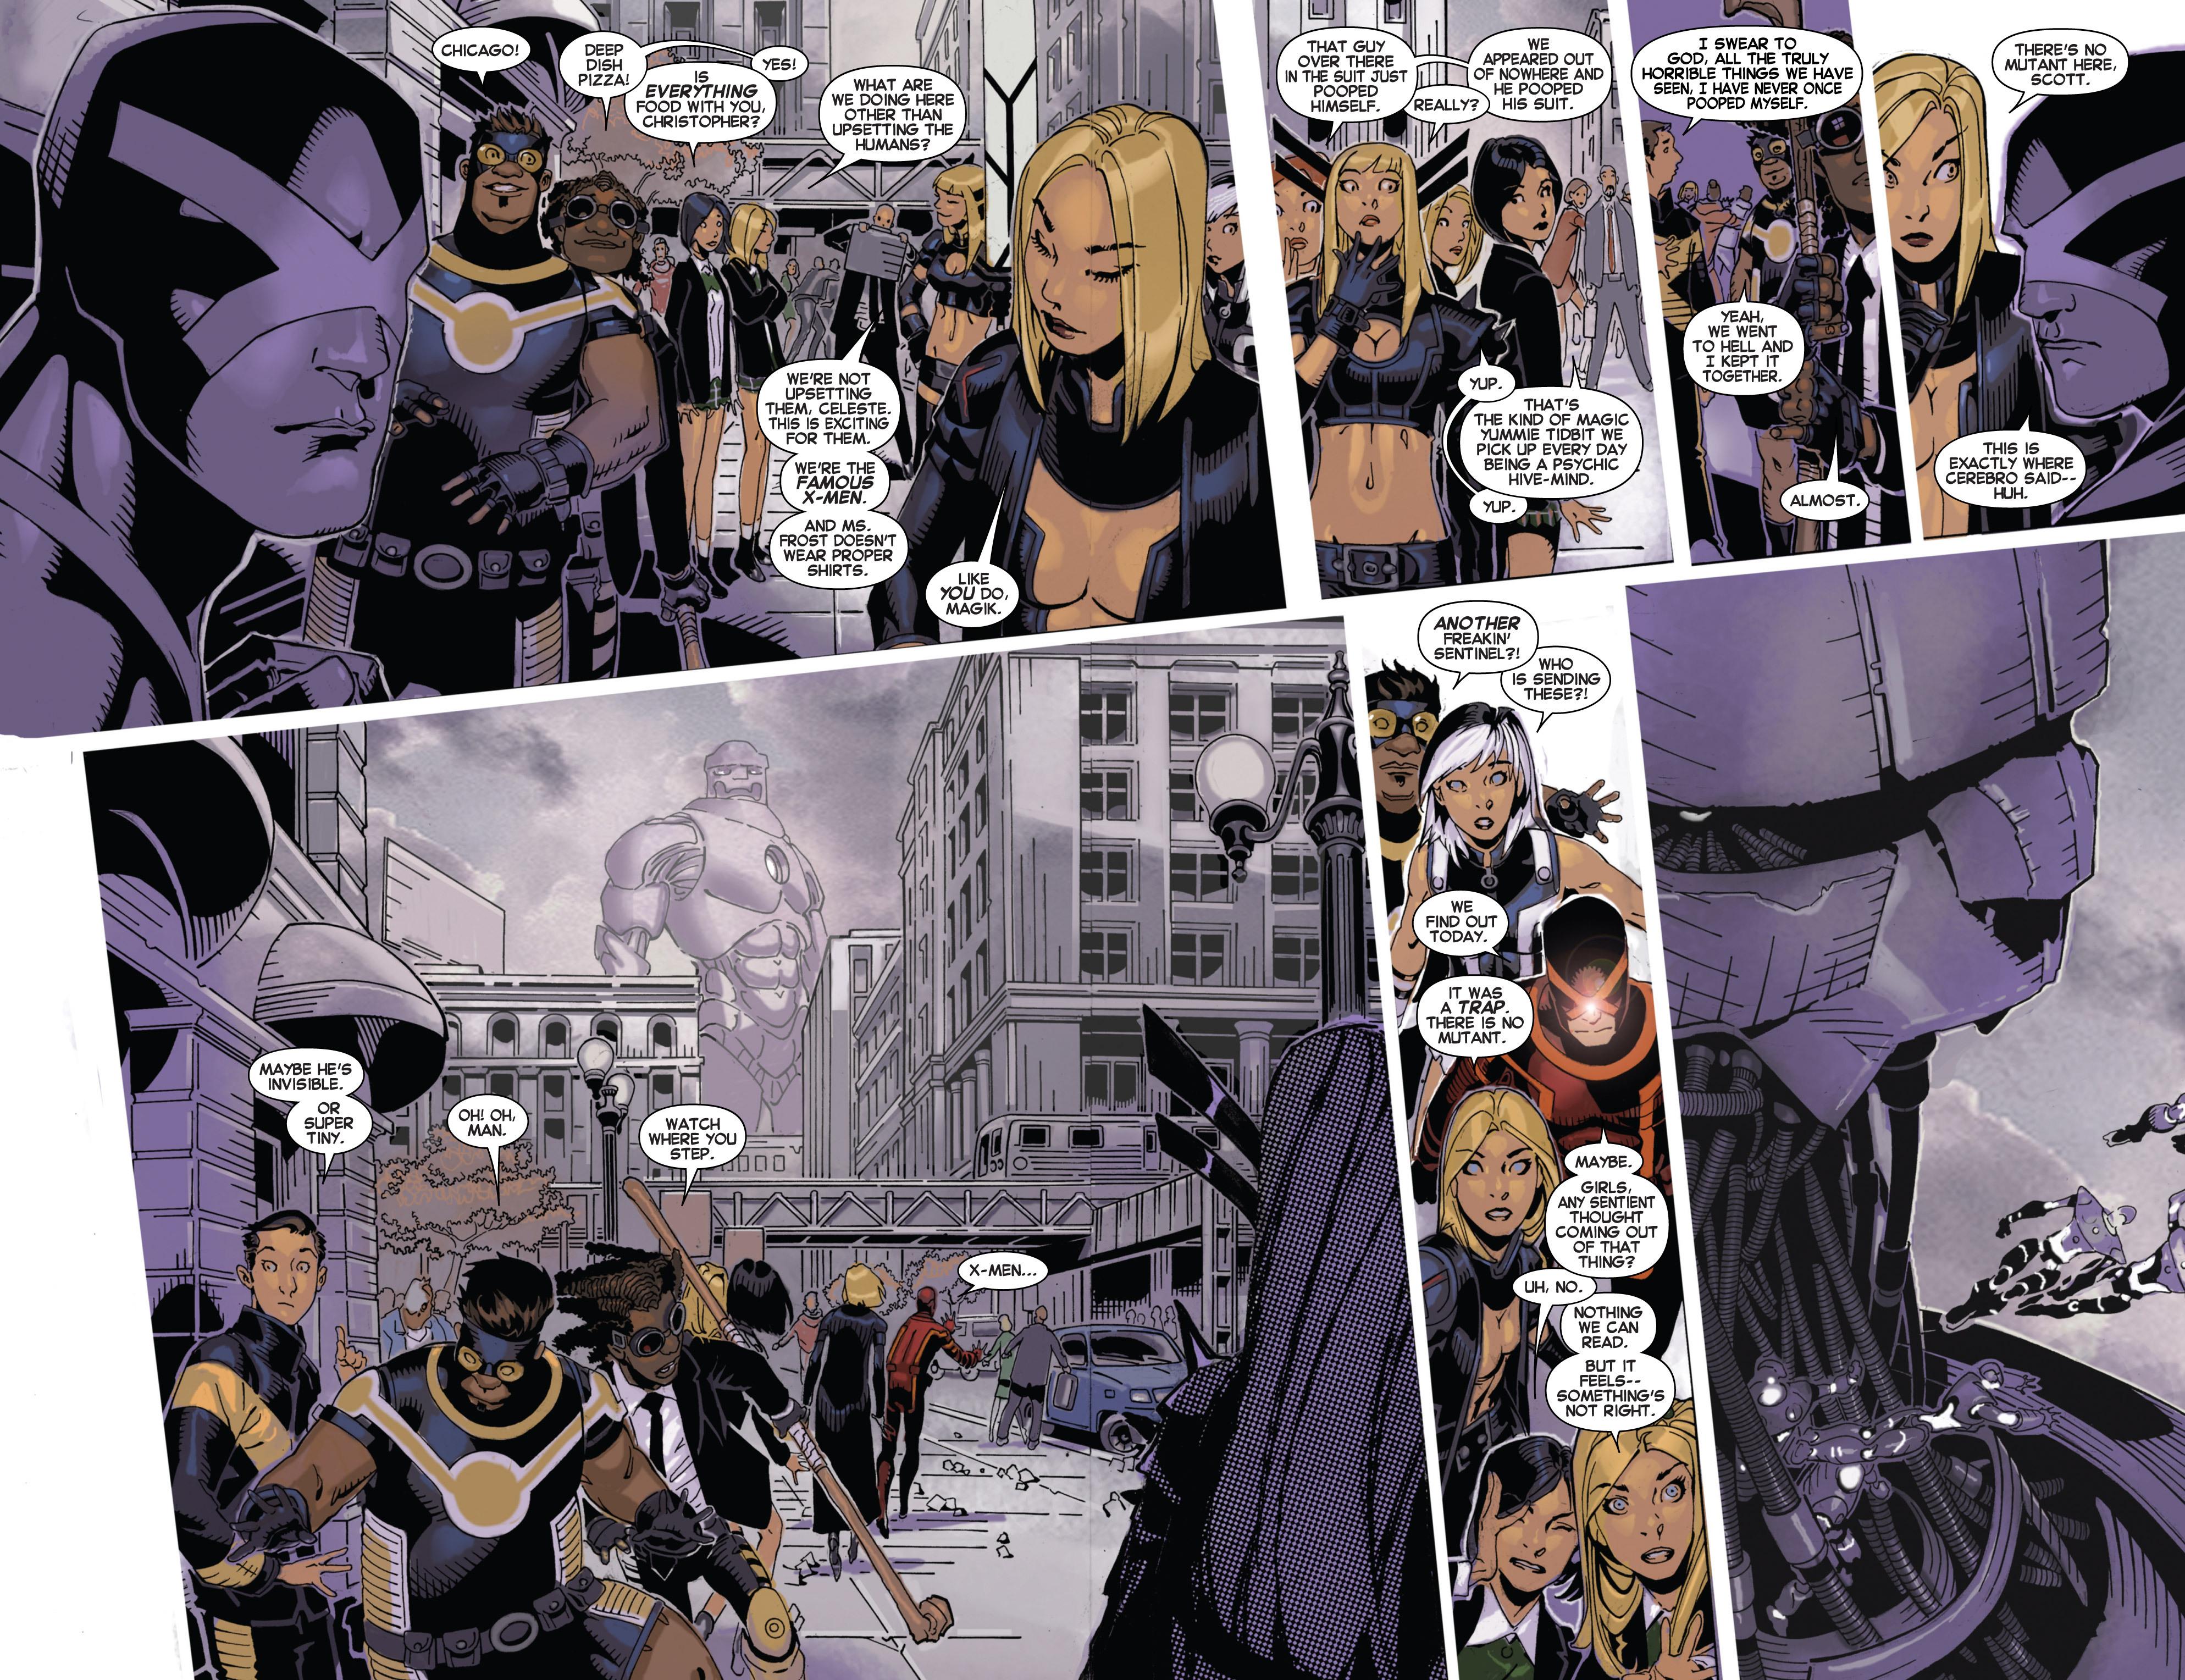 Read online Uncanny X-Men (2013) comic -  Issue # _TPB 4 - vs. S.H.I.E.L.D - 13